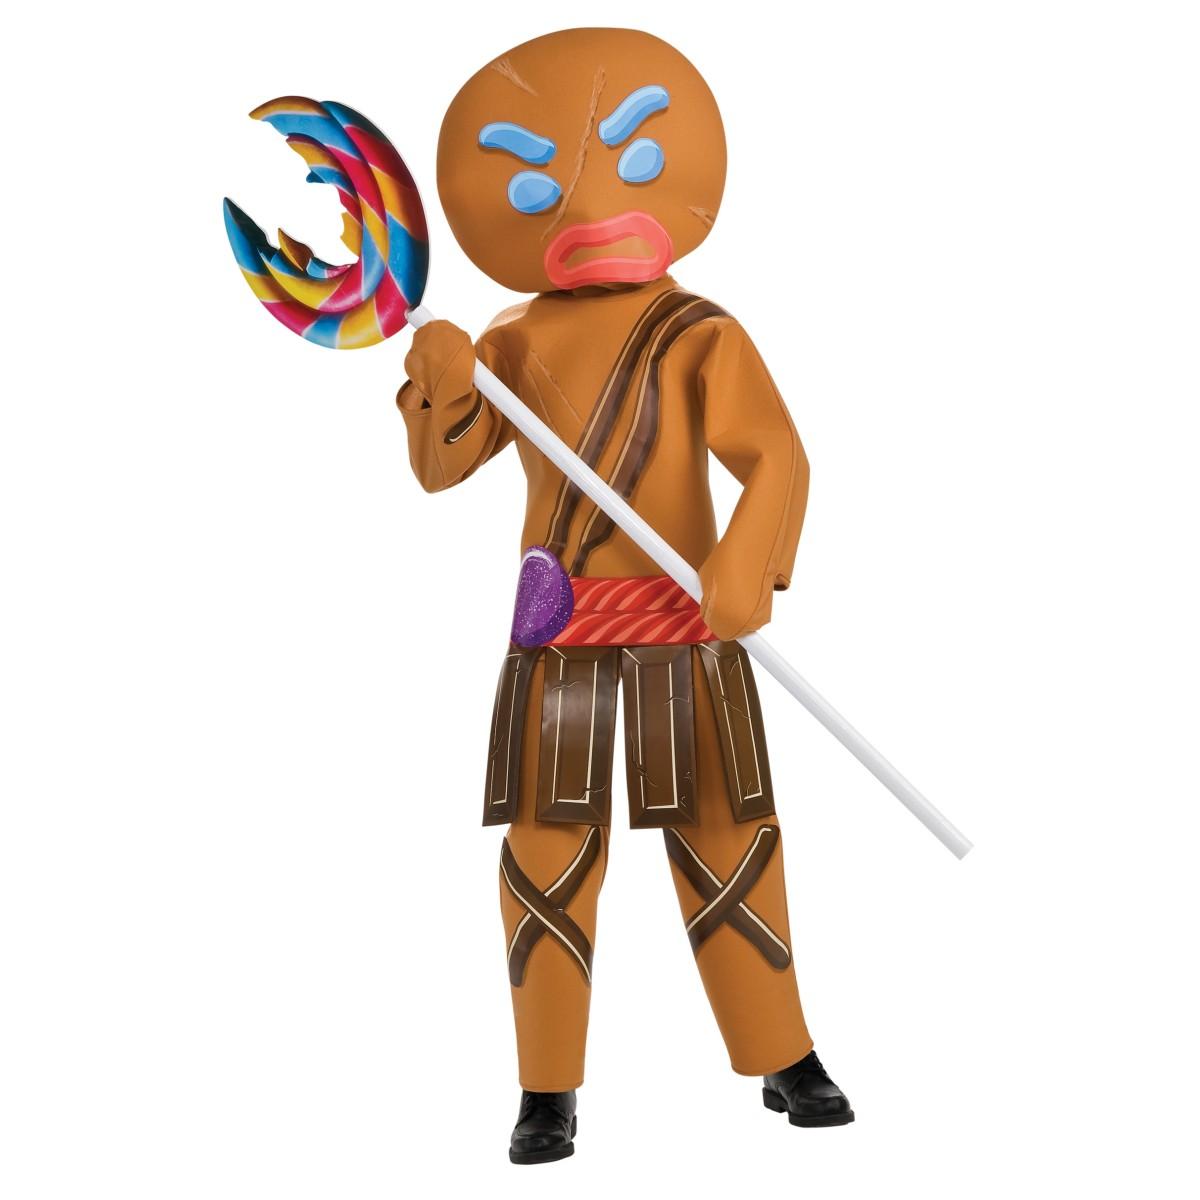 shrek gingerbread man costume adult eBay